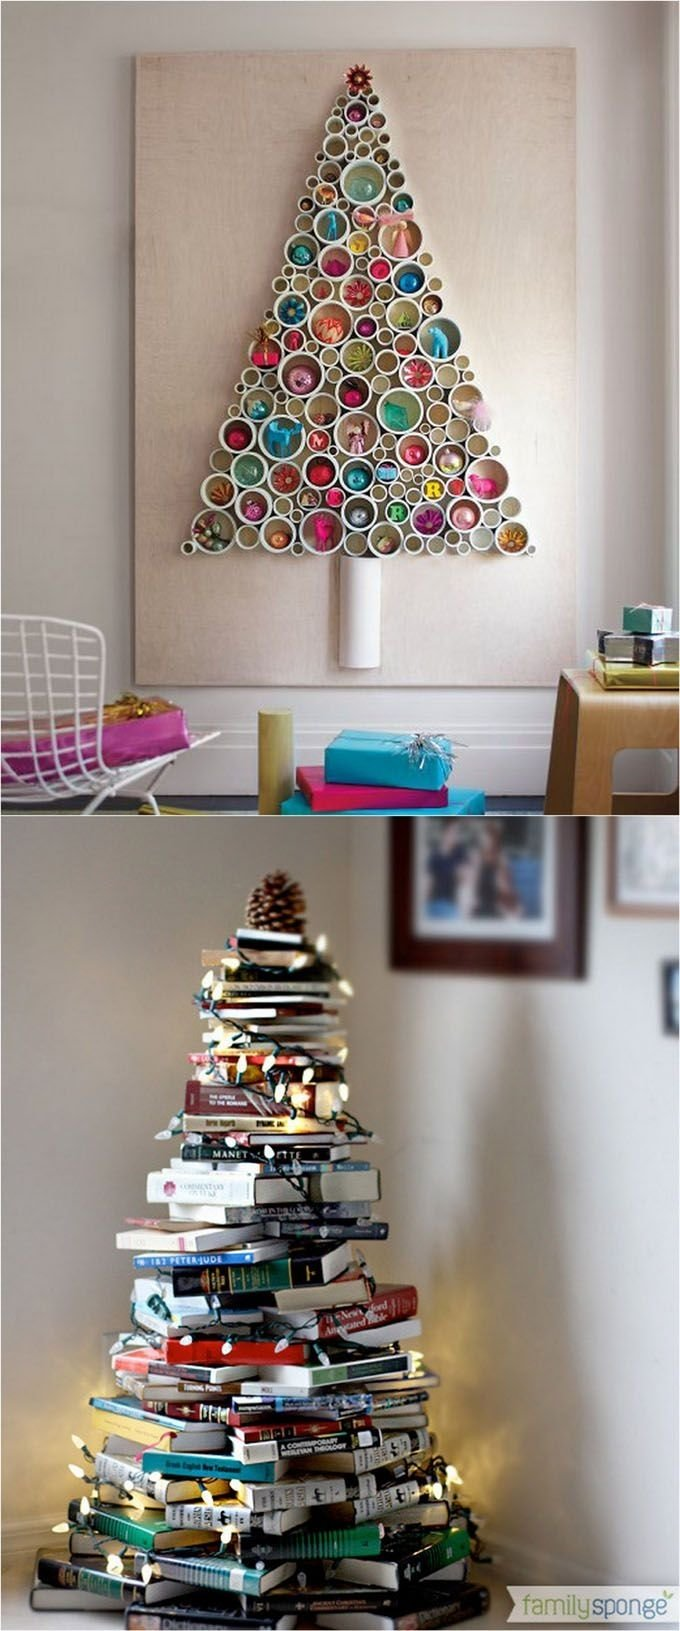 10 Pretty Unique Christmas Tree Decorating Ideas amazing christmas decoration ideas diy christmas trees unique 1